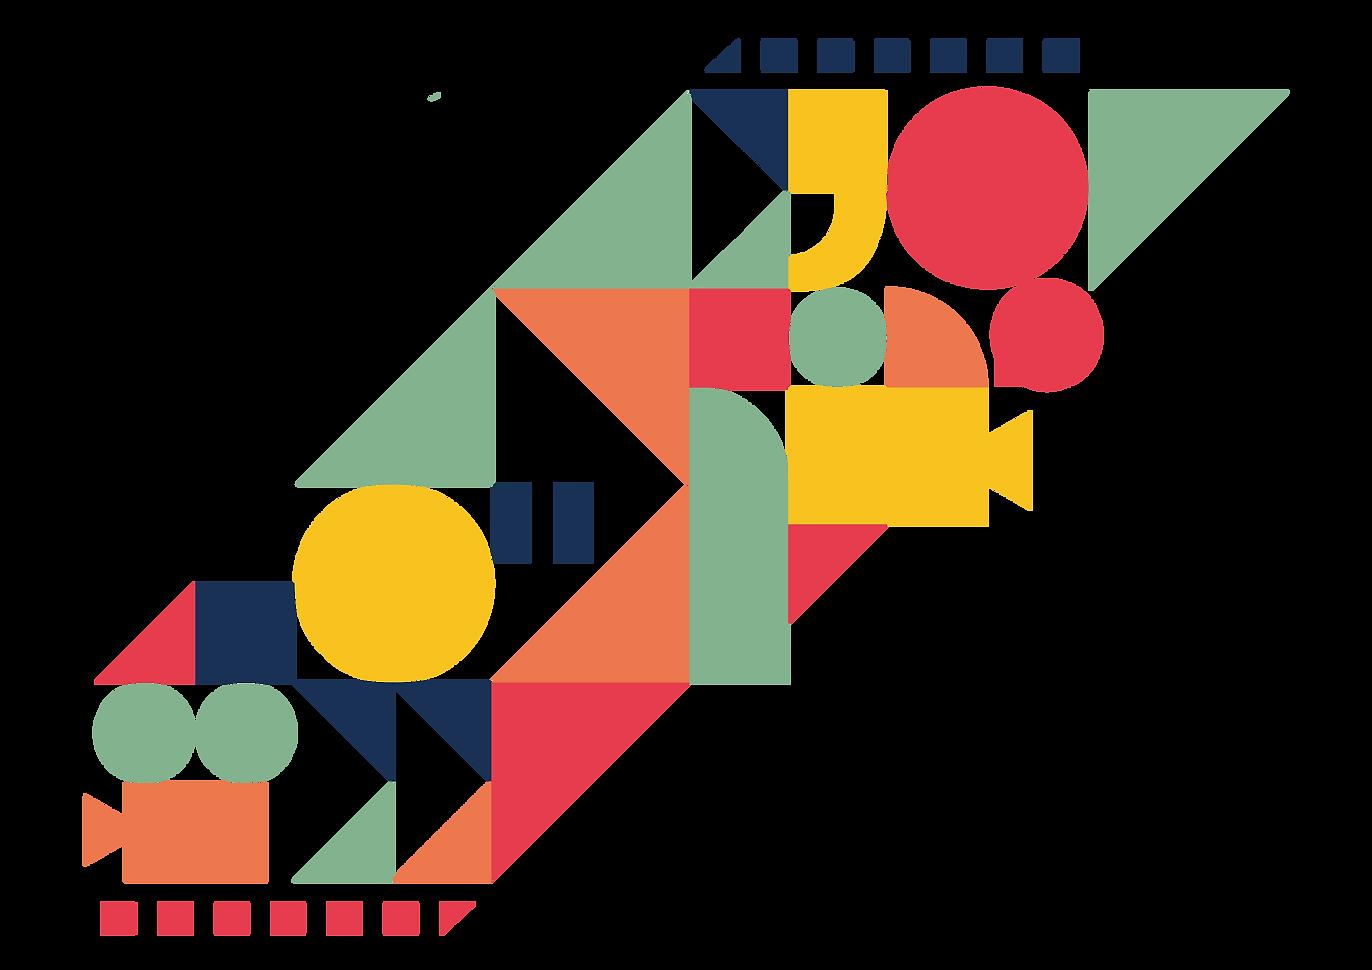 CINEMAVERICKS_1021_Logos_Univers graphique1.png